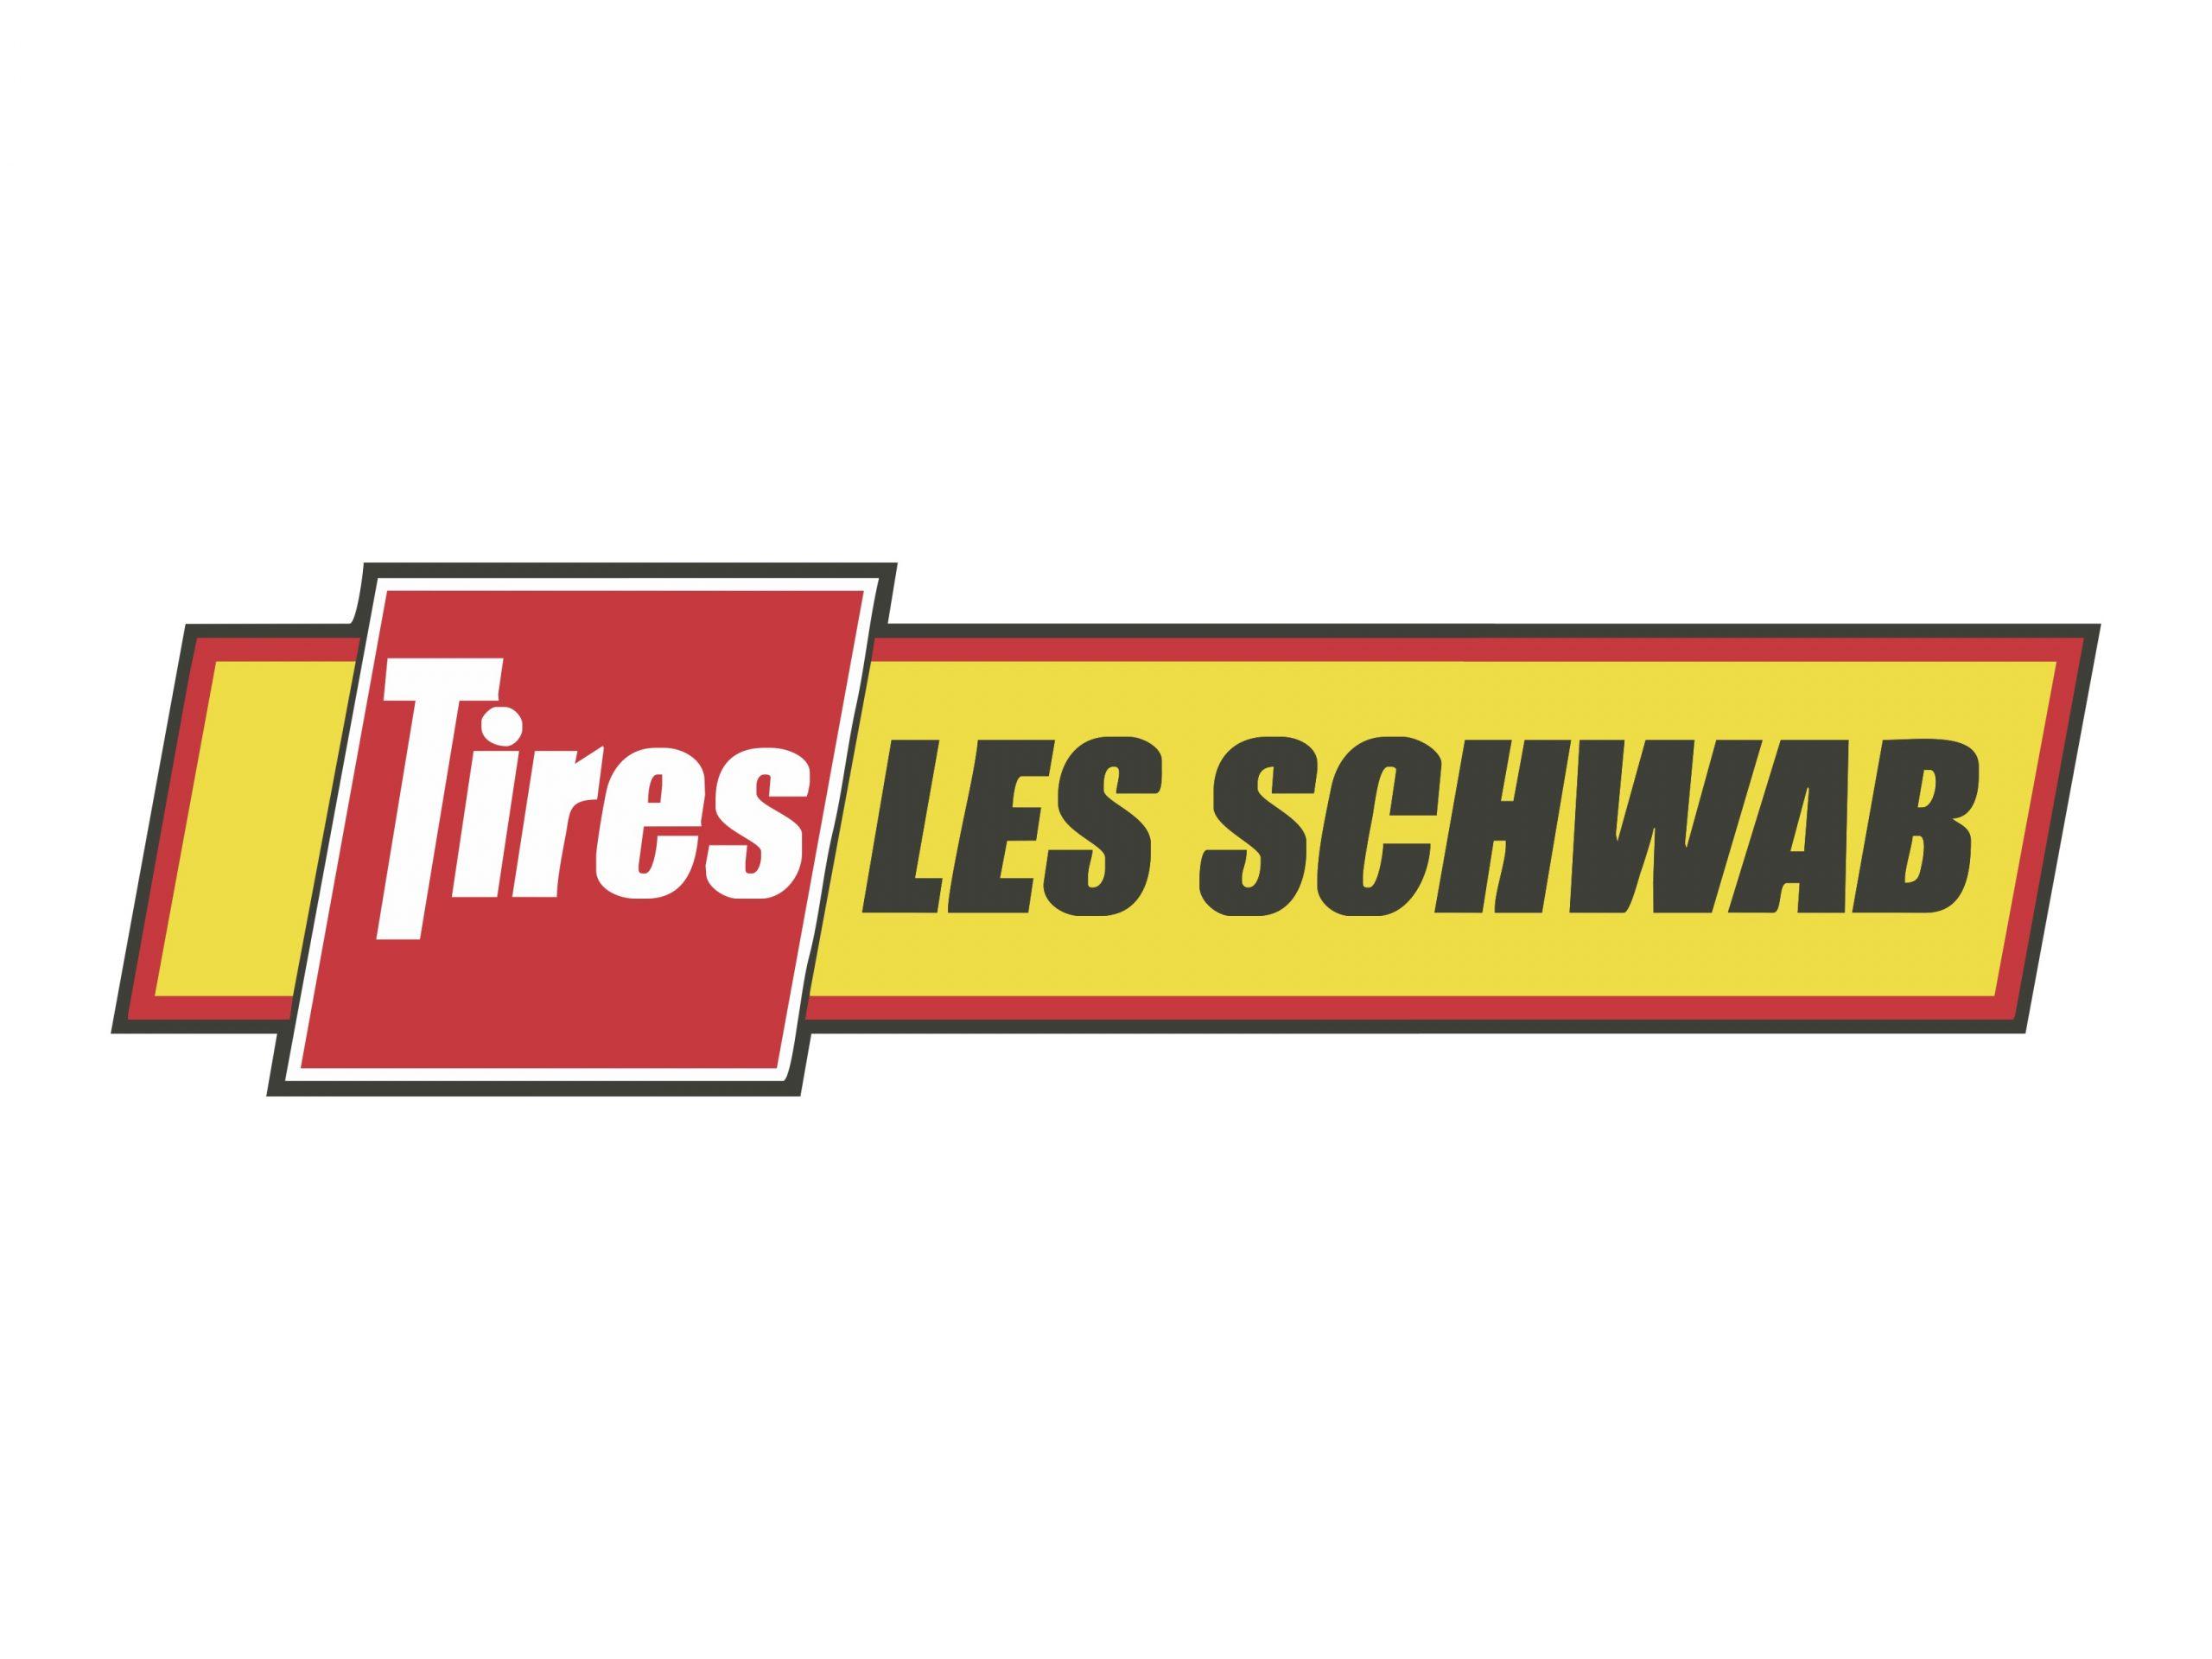 Les Schwab 4x3 Banner